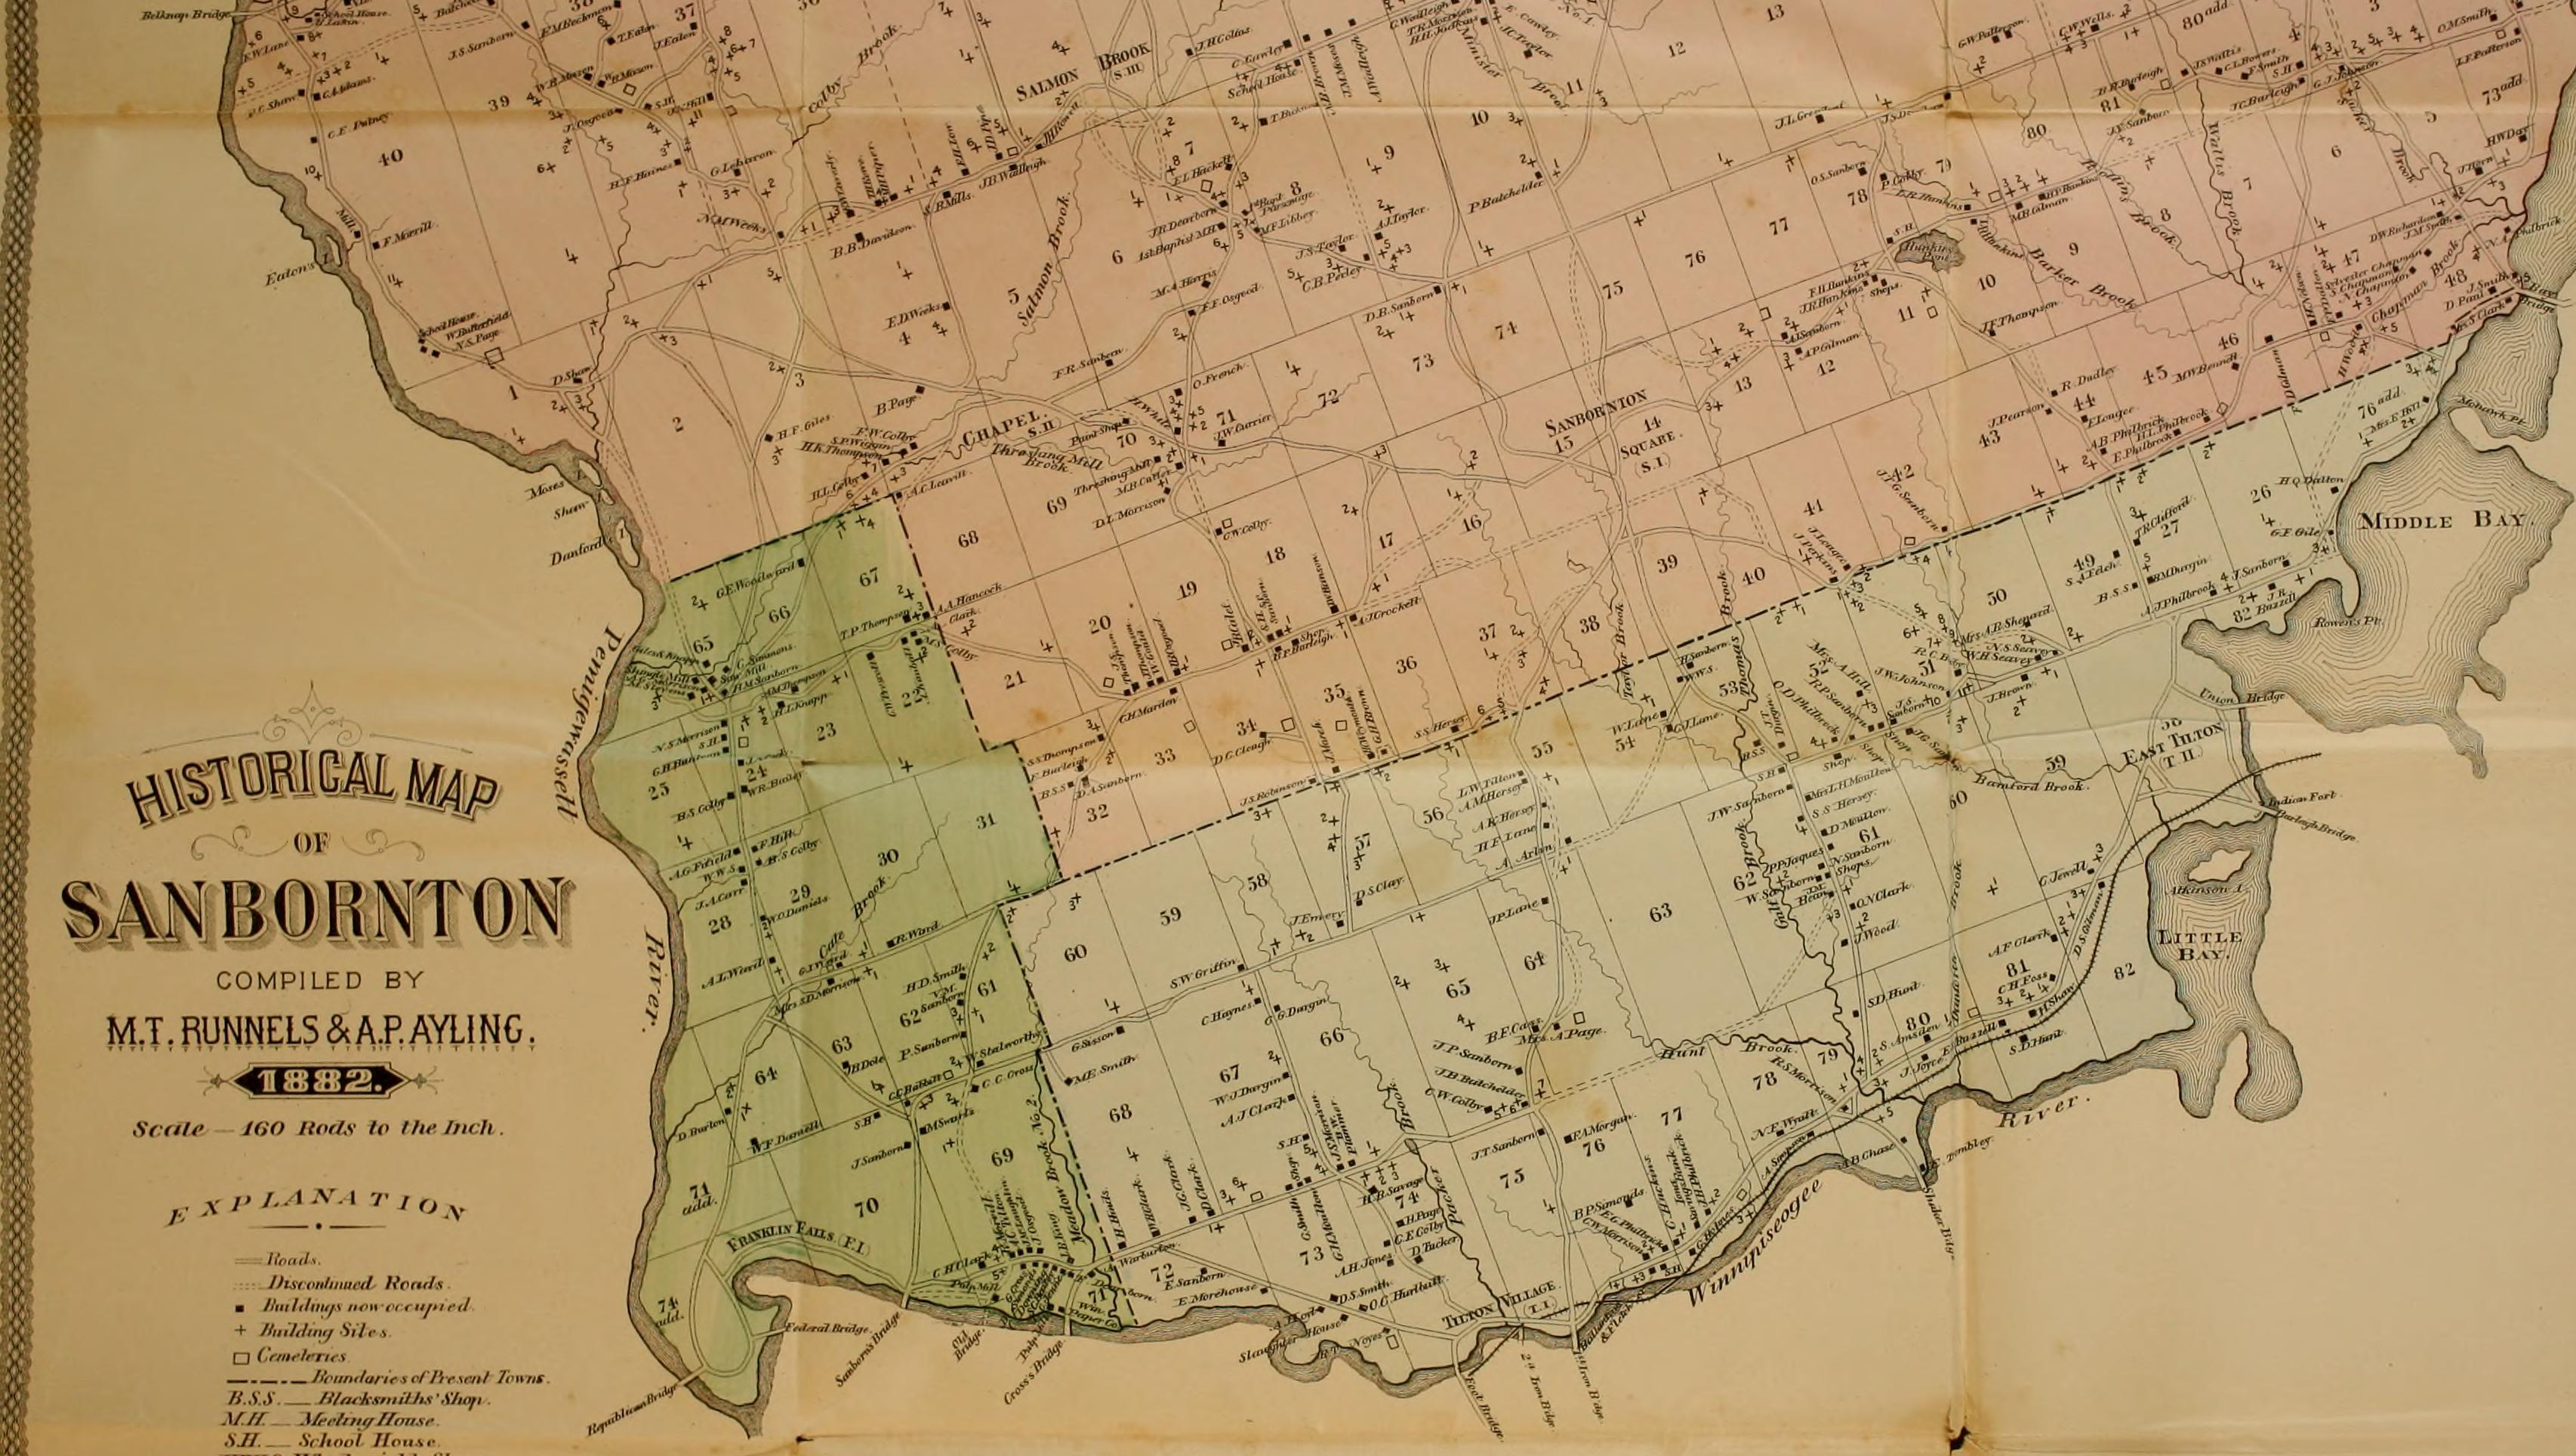 File:History of Sanbornton, New Hampshire (1882 ... on lake winnipesaukee nh map, new london nh map, gilford nh map, hooksett nh map, nh fish and game map, tuftonboro nh map, ossipee nh map, nashua nh map, dracut nh map, north ashland nh map, goffstown nh map, belmont nh map, tilton nh map, brattleboro nh map, contoocook nh map, laconia nh map, winnisquam lake nh map, half moon lake nh map, gilmanton nh town map, swanzey nh map,